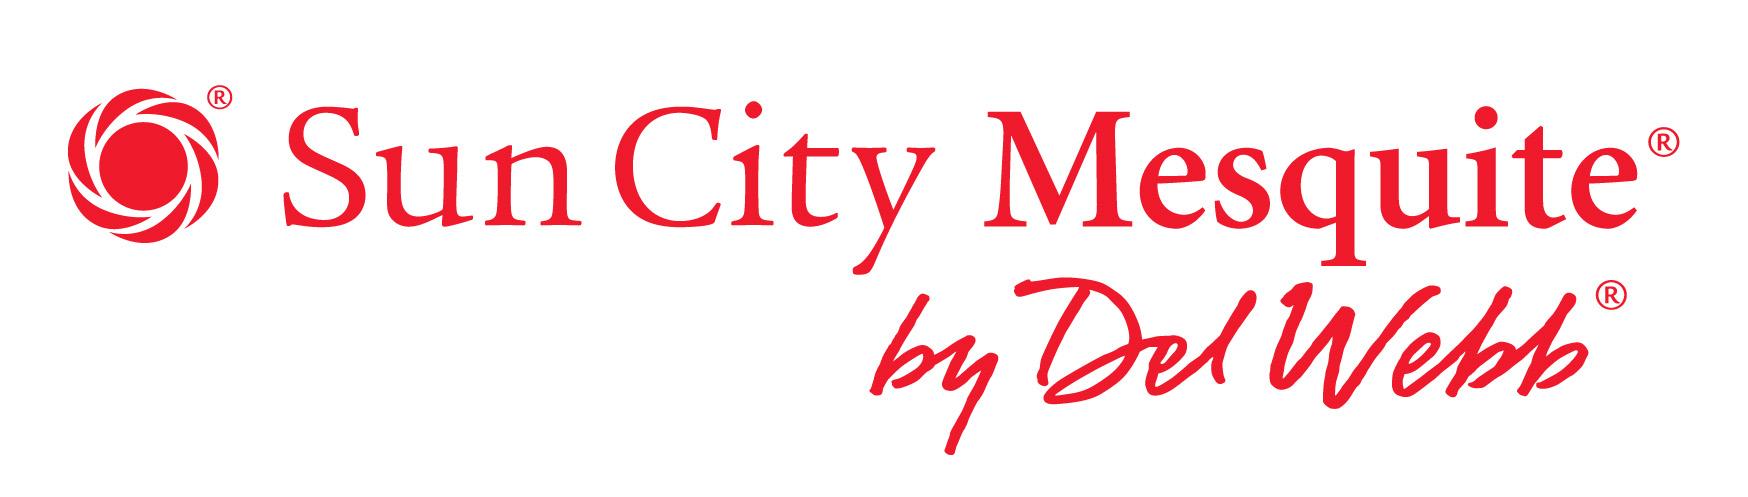 Sun City Mesquite Gourmet Club